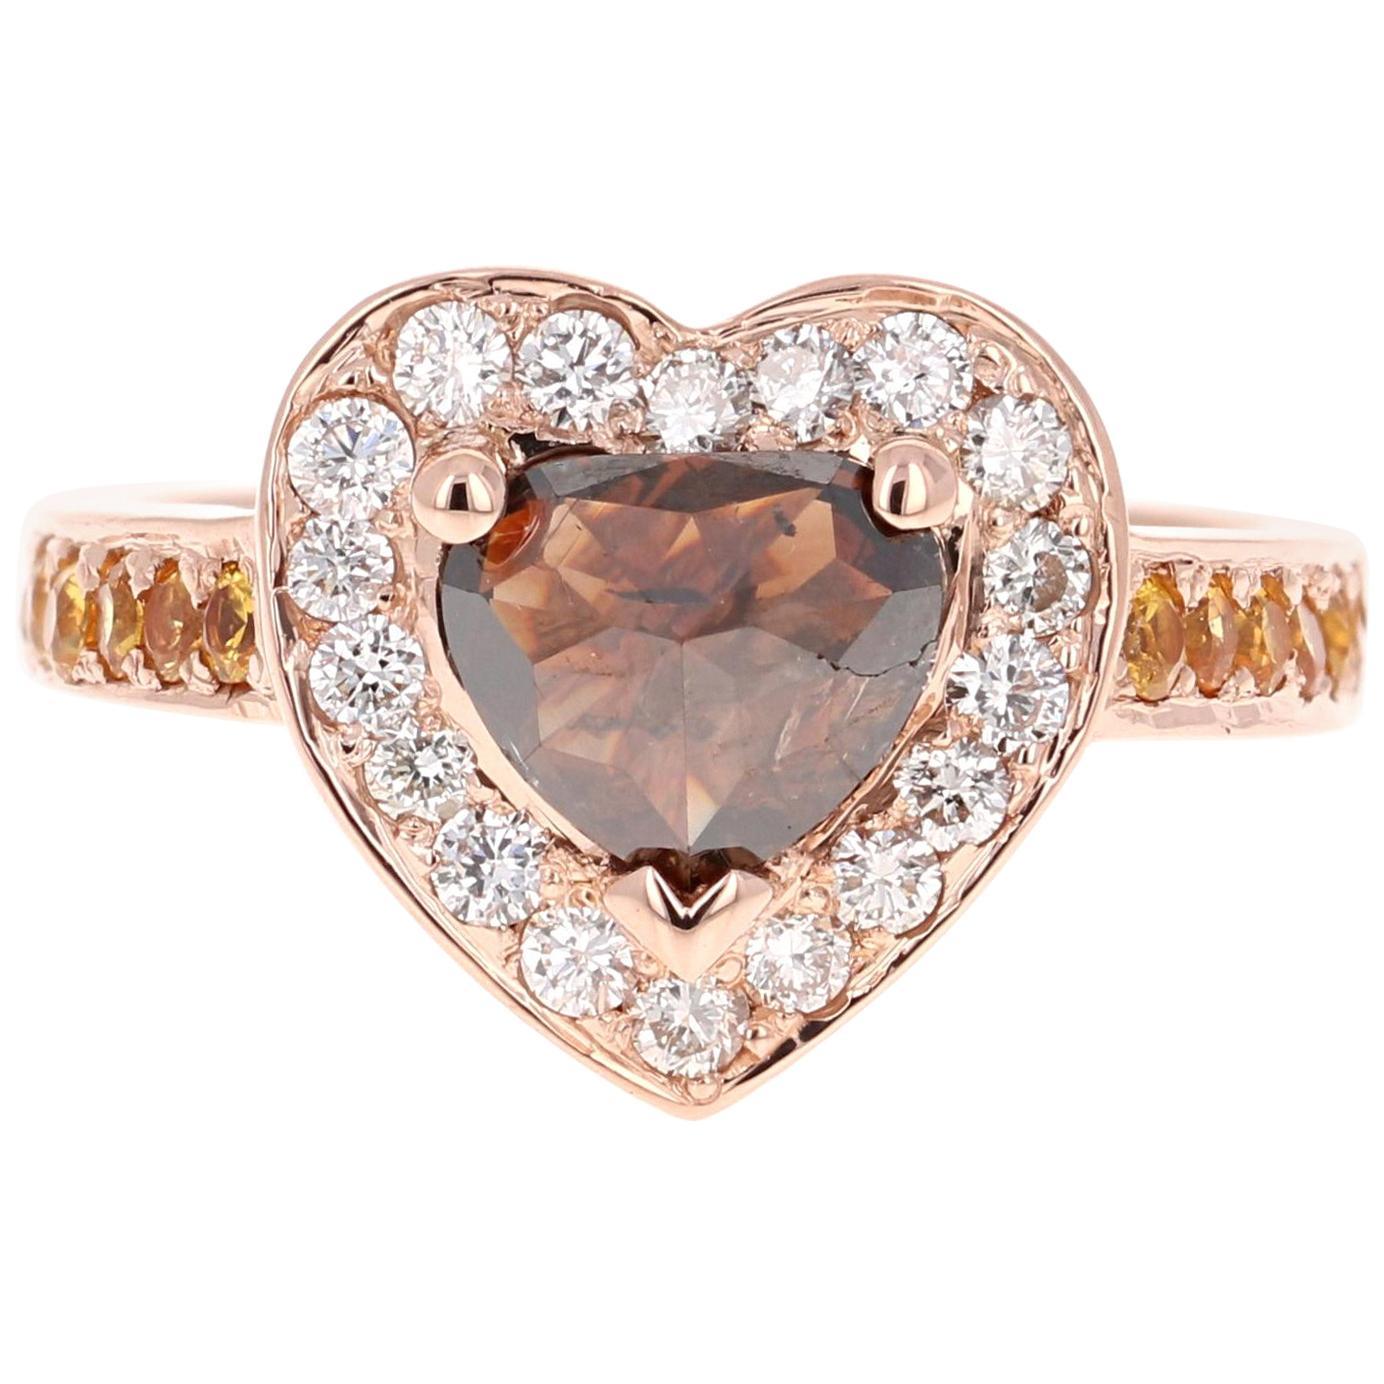 2.43 Carat Heart Cut Fancy Diamond Engagement Ring 14 Karat Rose Gold